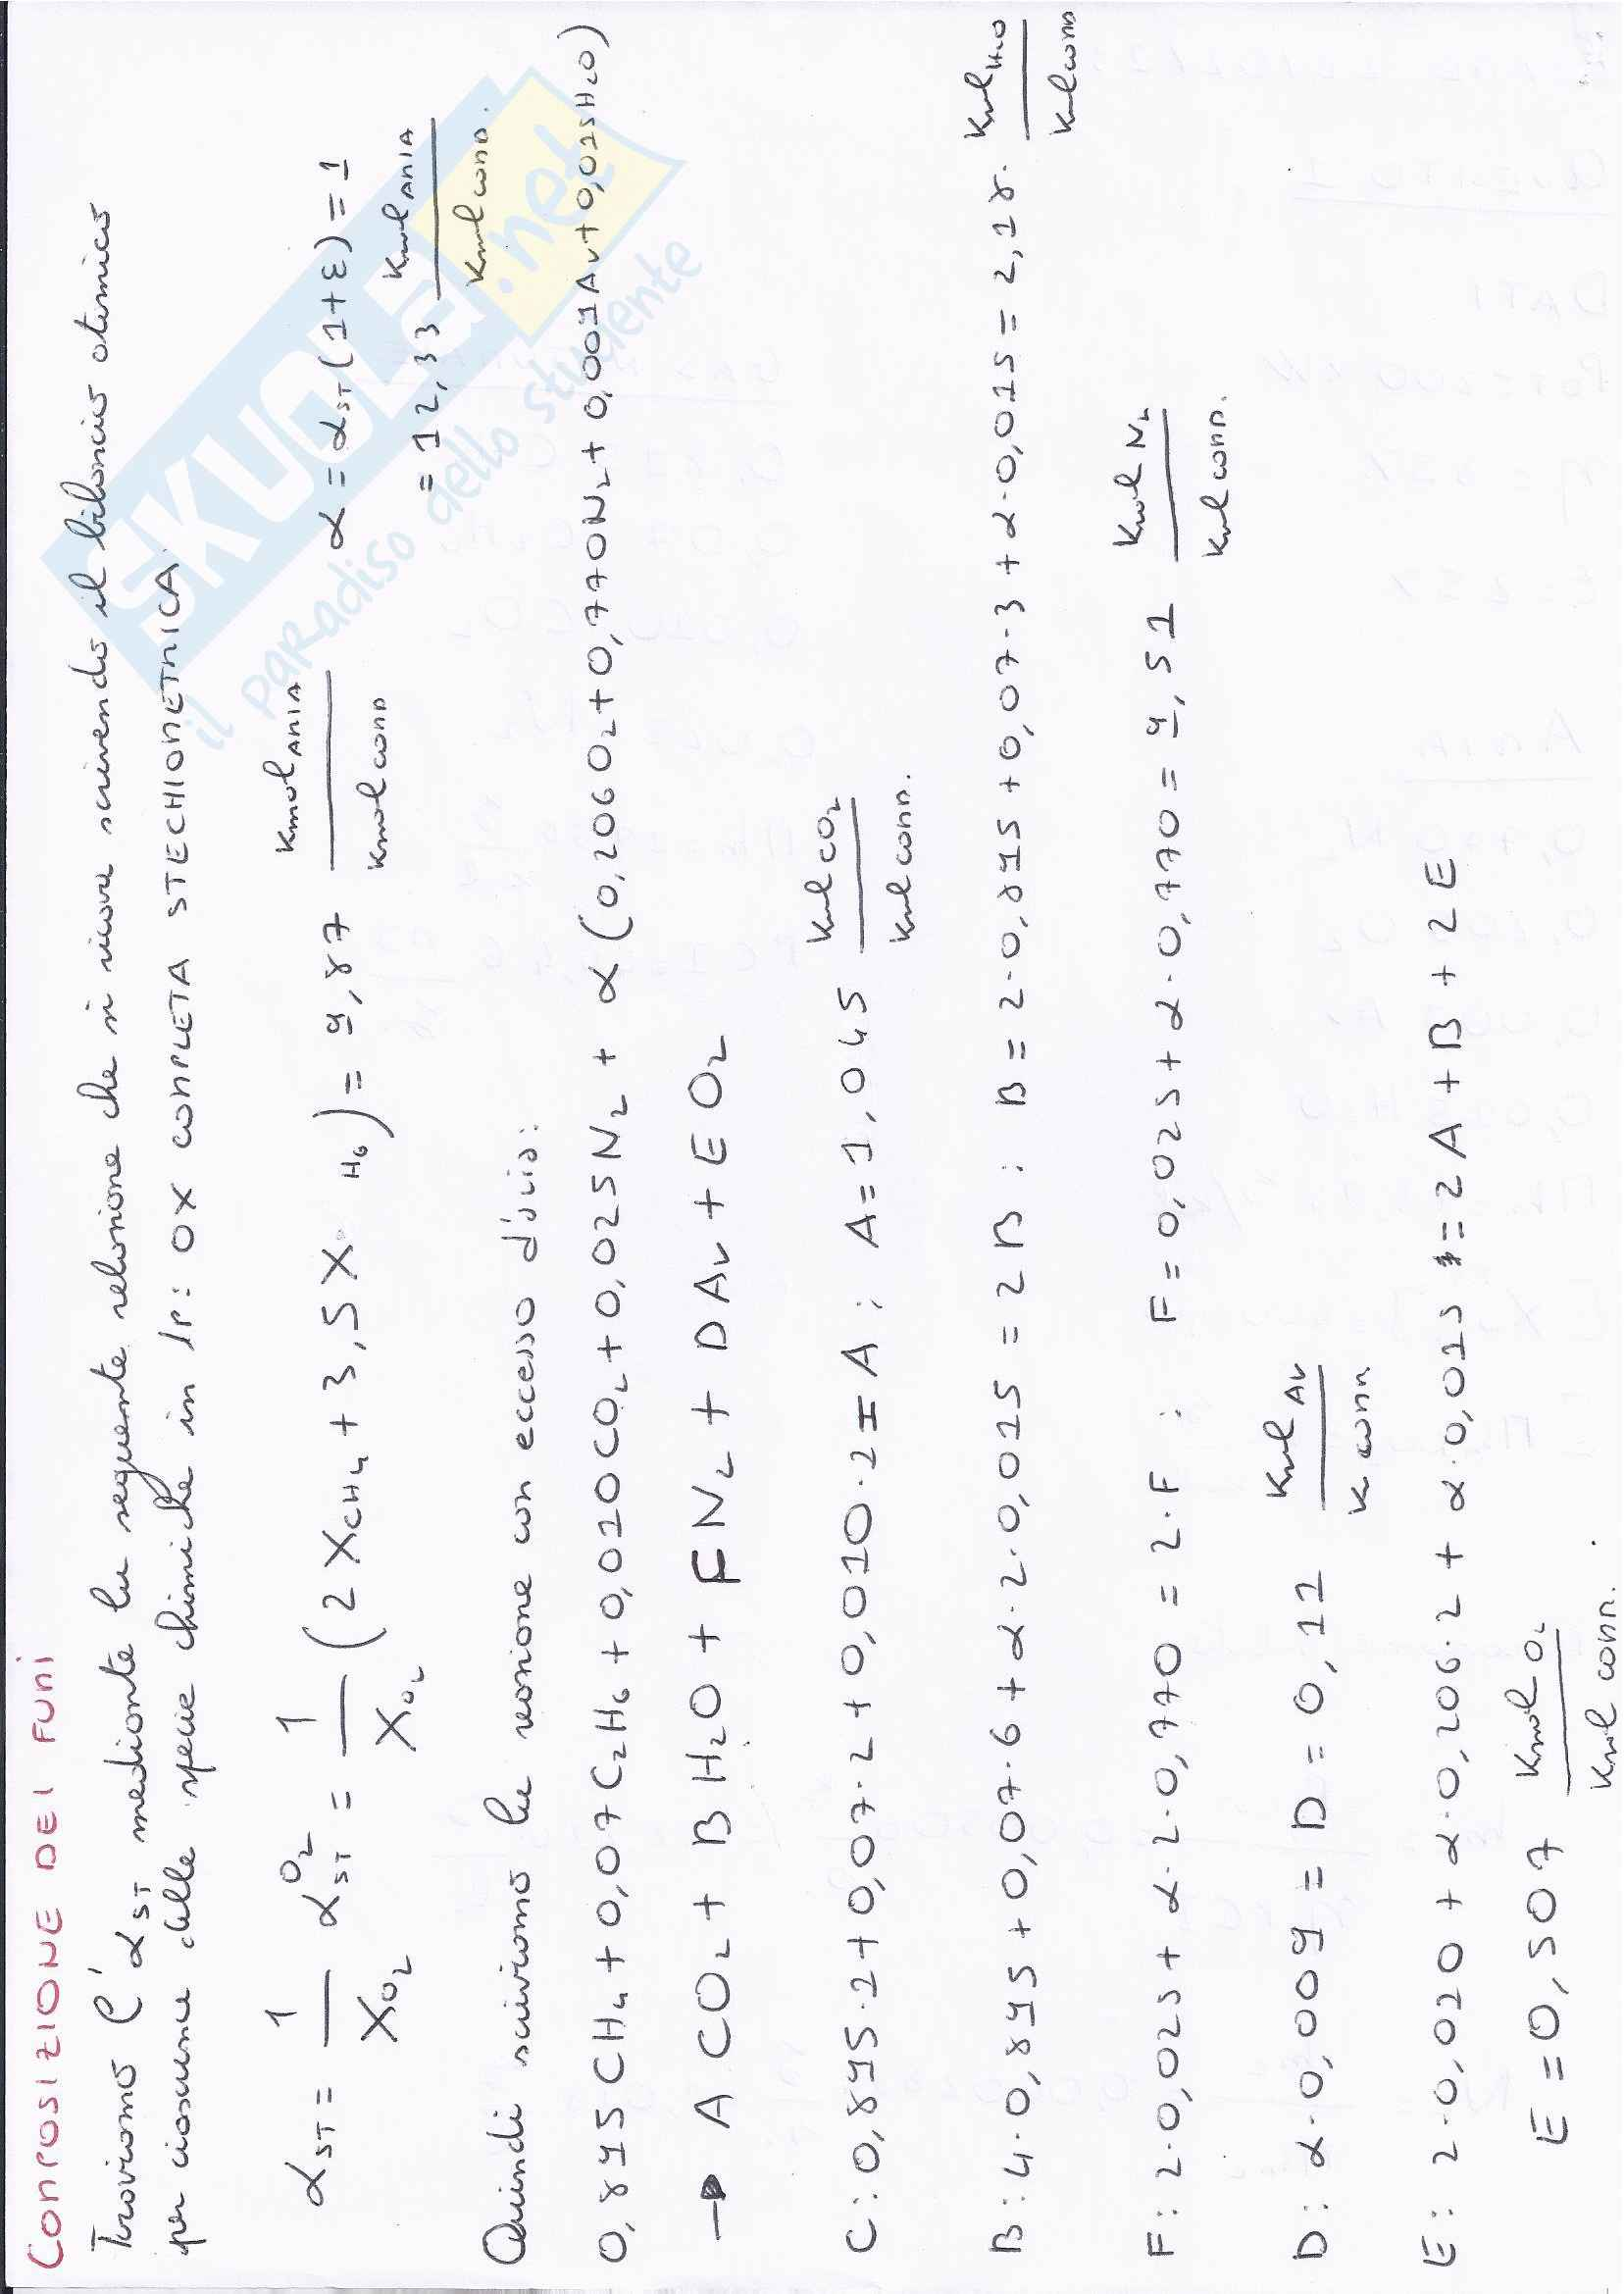 Sistemi energetici - esame svolto Pag. 2